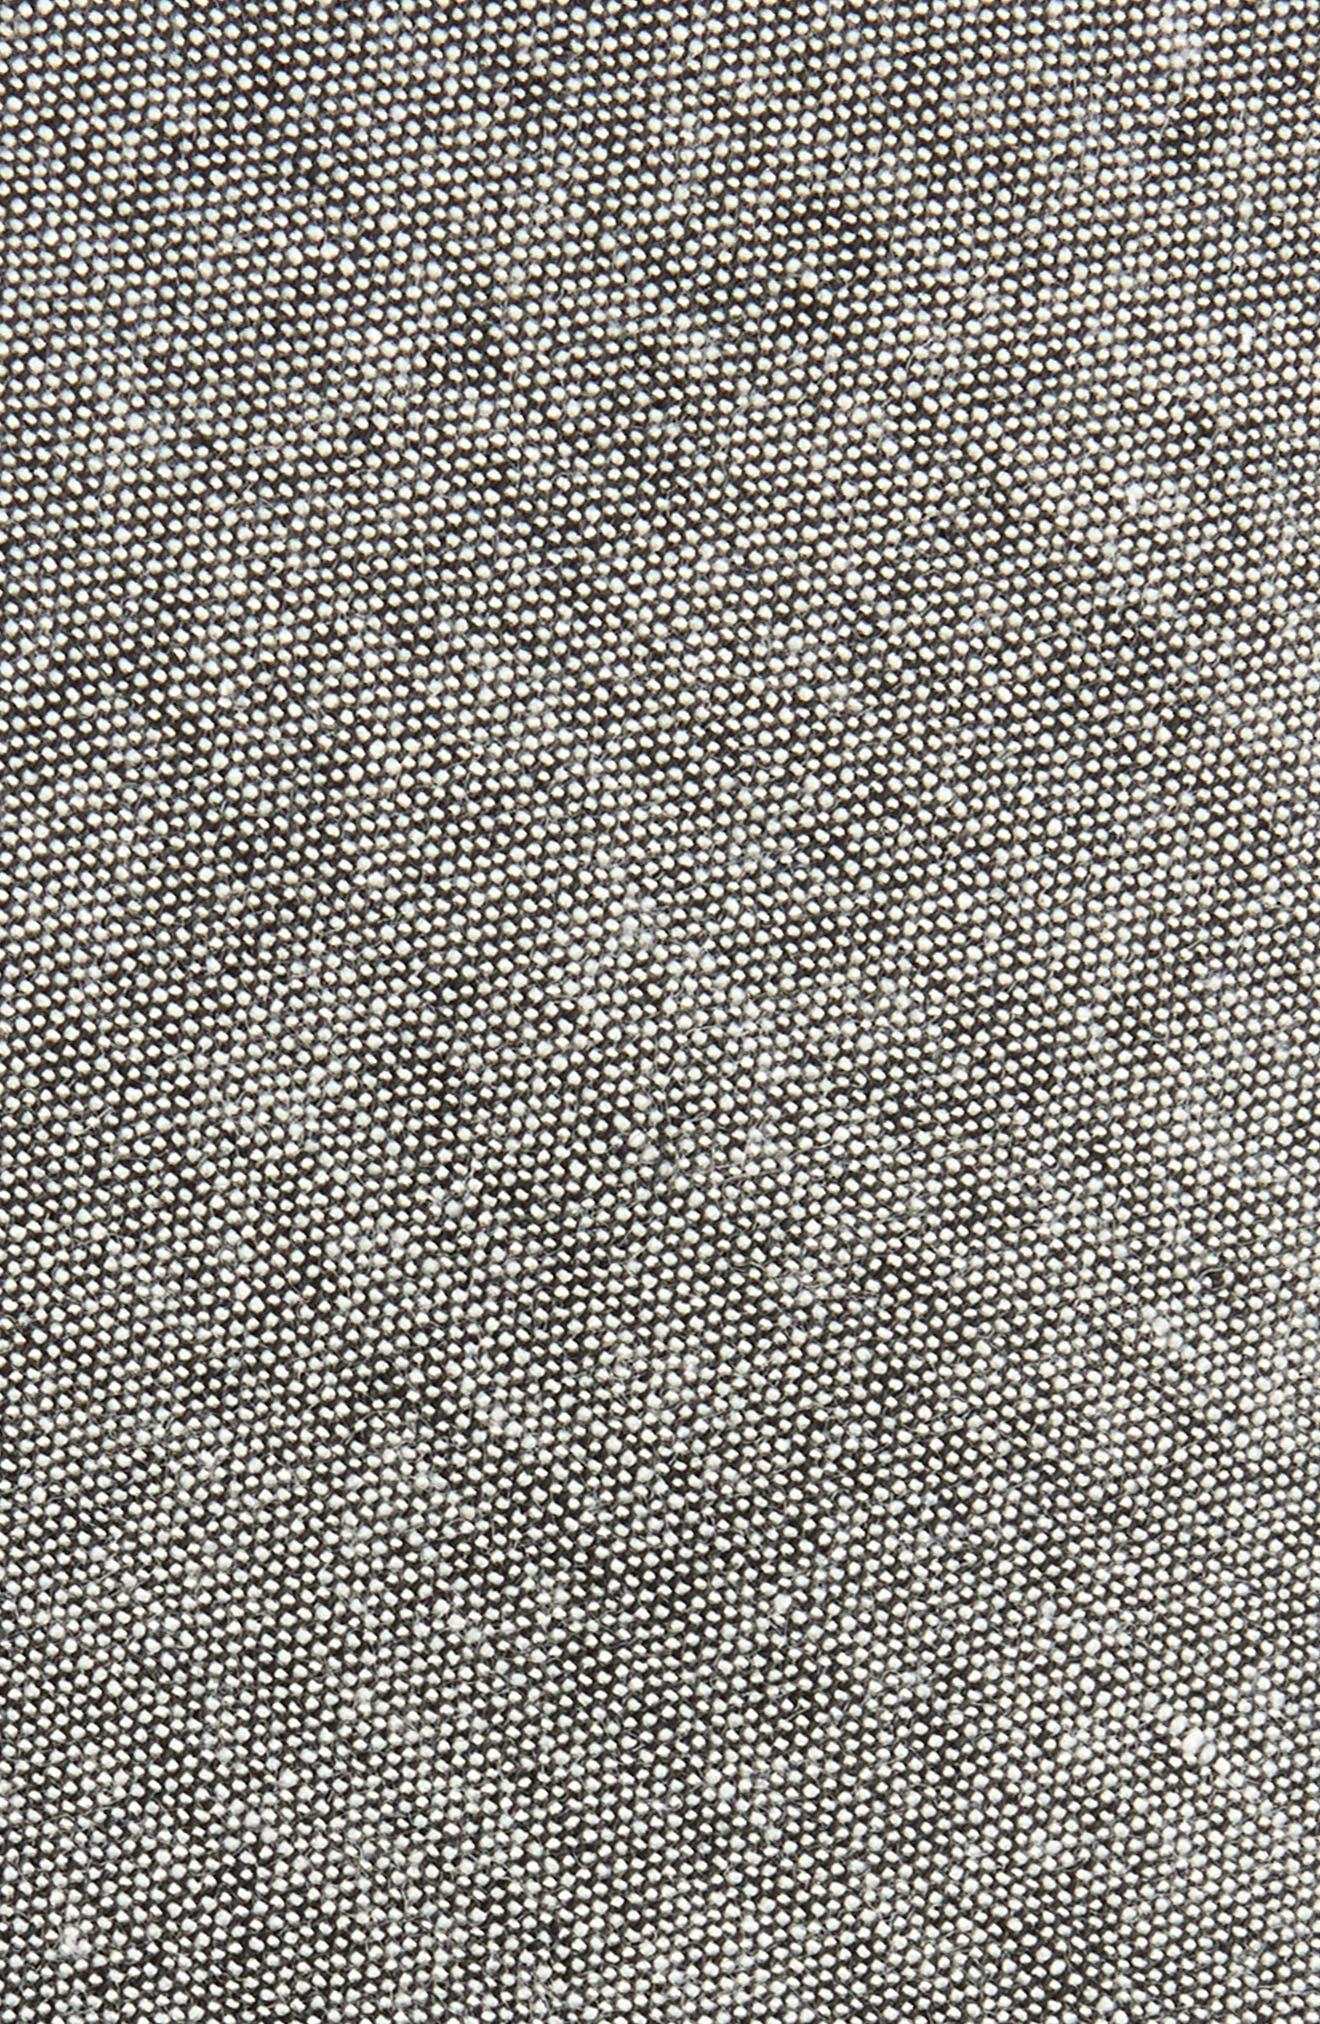 Textured Skinny Tie,                             Alternate thumbnail 2, color,                             001